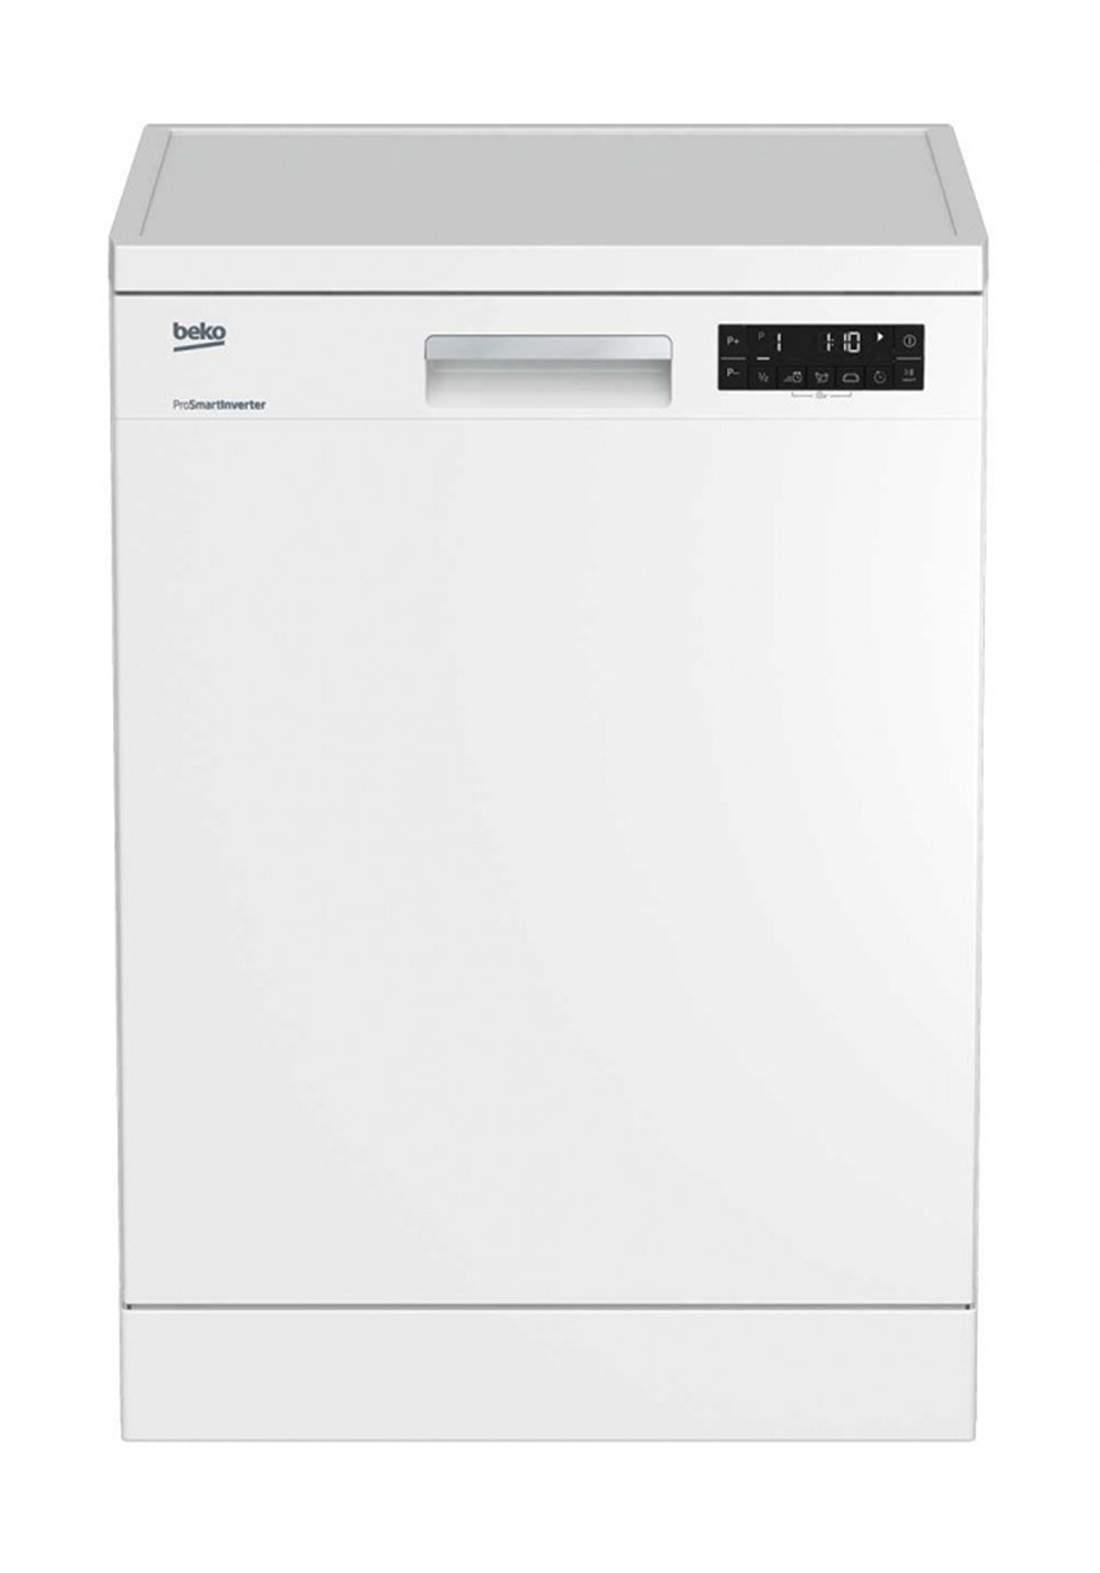 Beko  DFN 28424 W Dishwasher 8 Programs Capacity Of 14 Sets - White  غسالة صحون